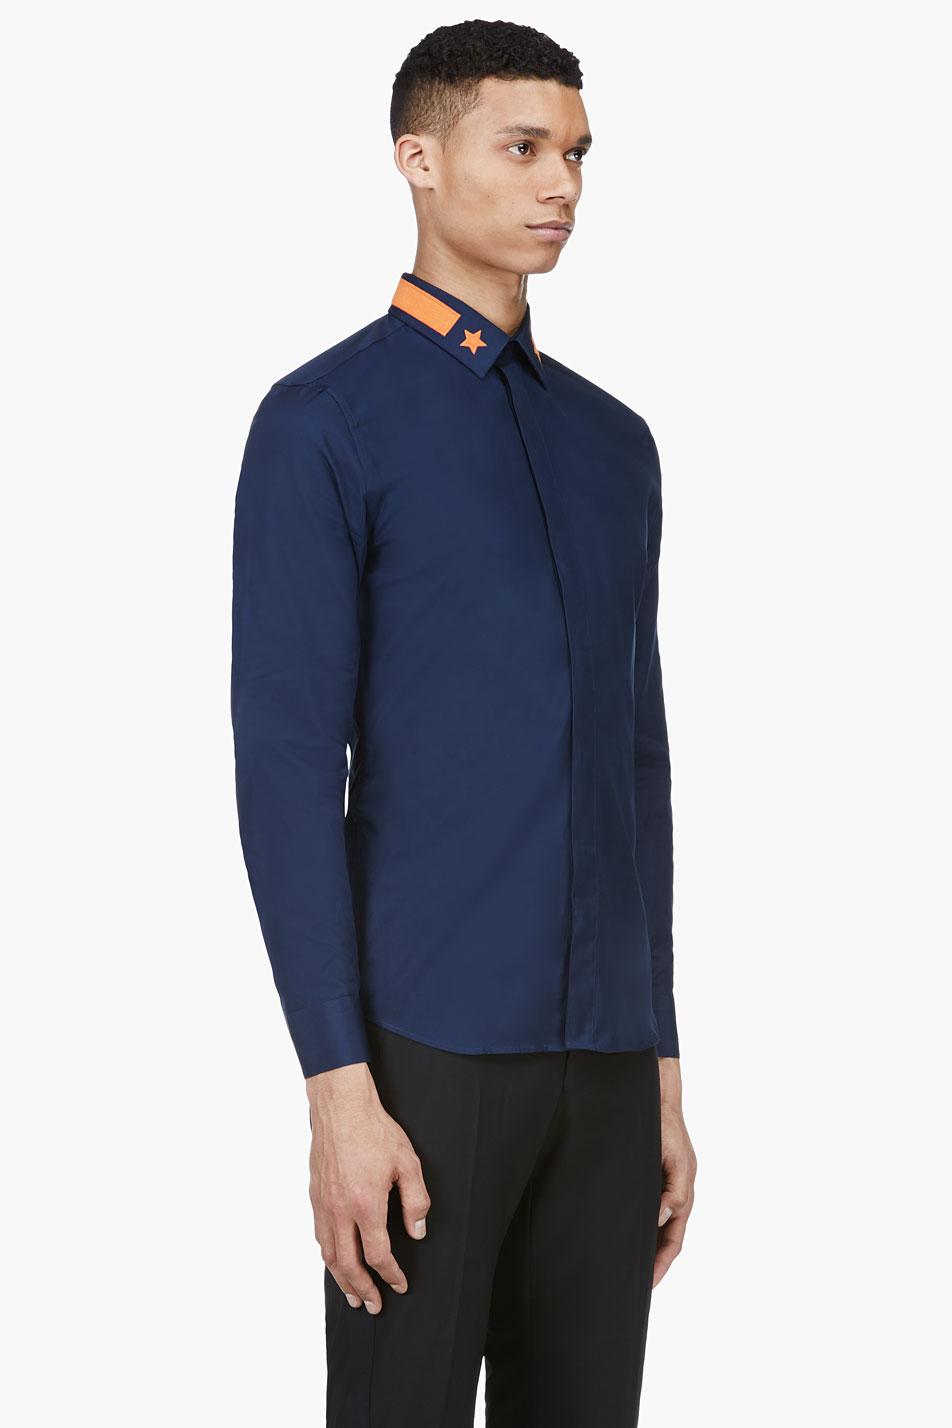 Star Appliqué Collar navy dress shirt menswear 2